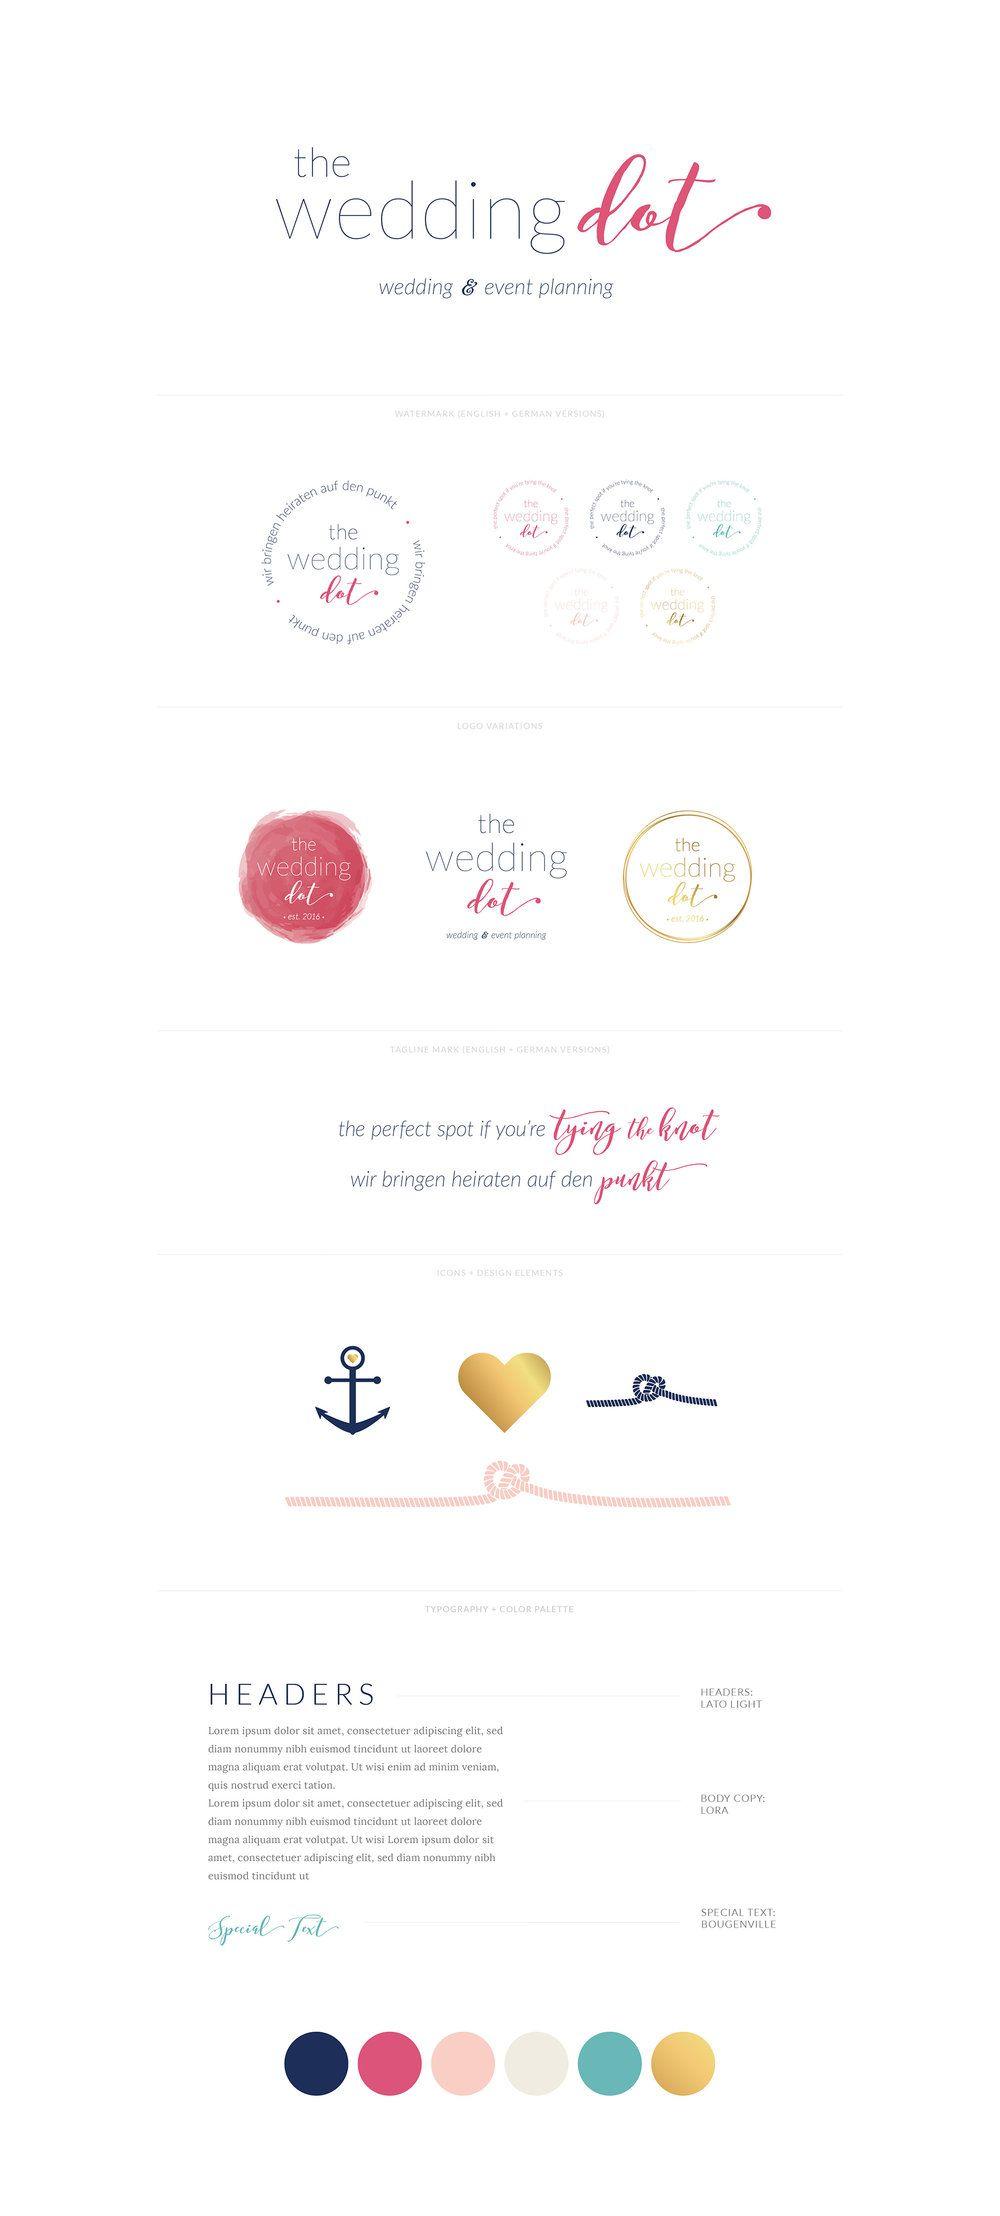 The Wedding Dot Visual Brand Design In 2020 Branding Design Visual Identity Design Visual Branding